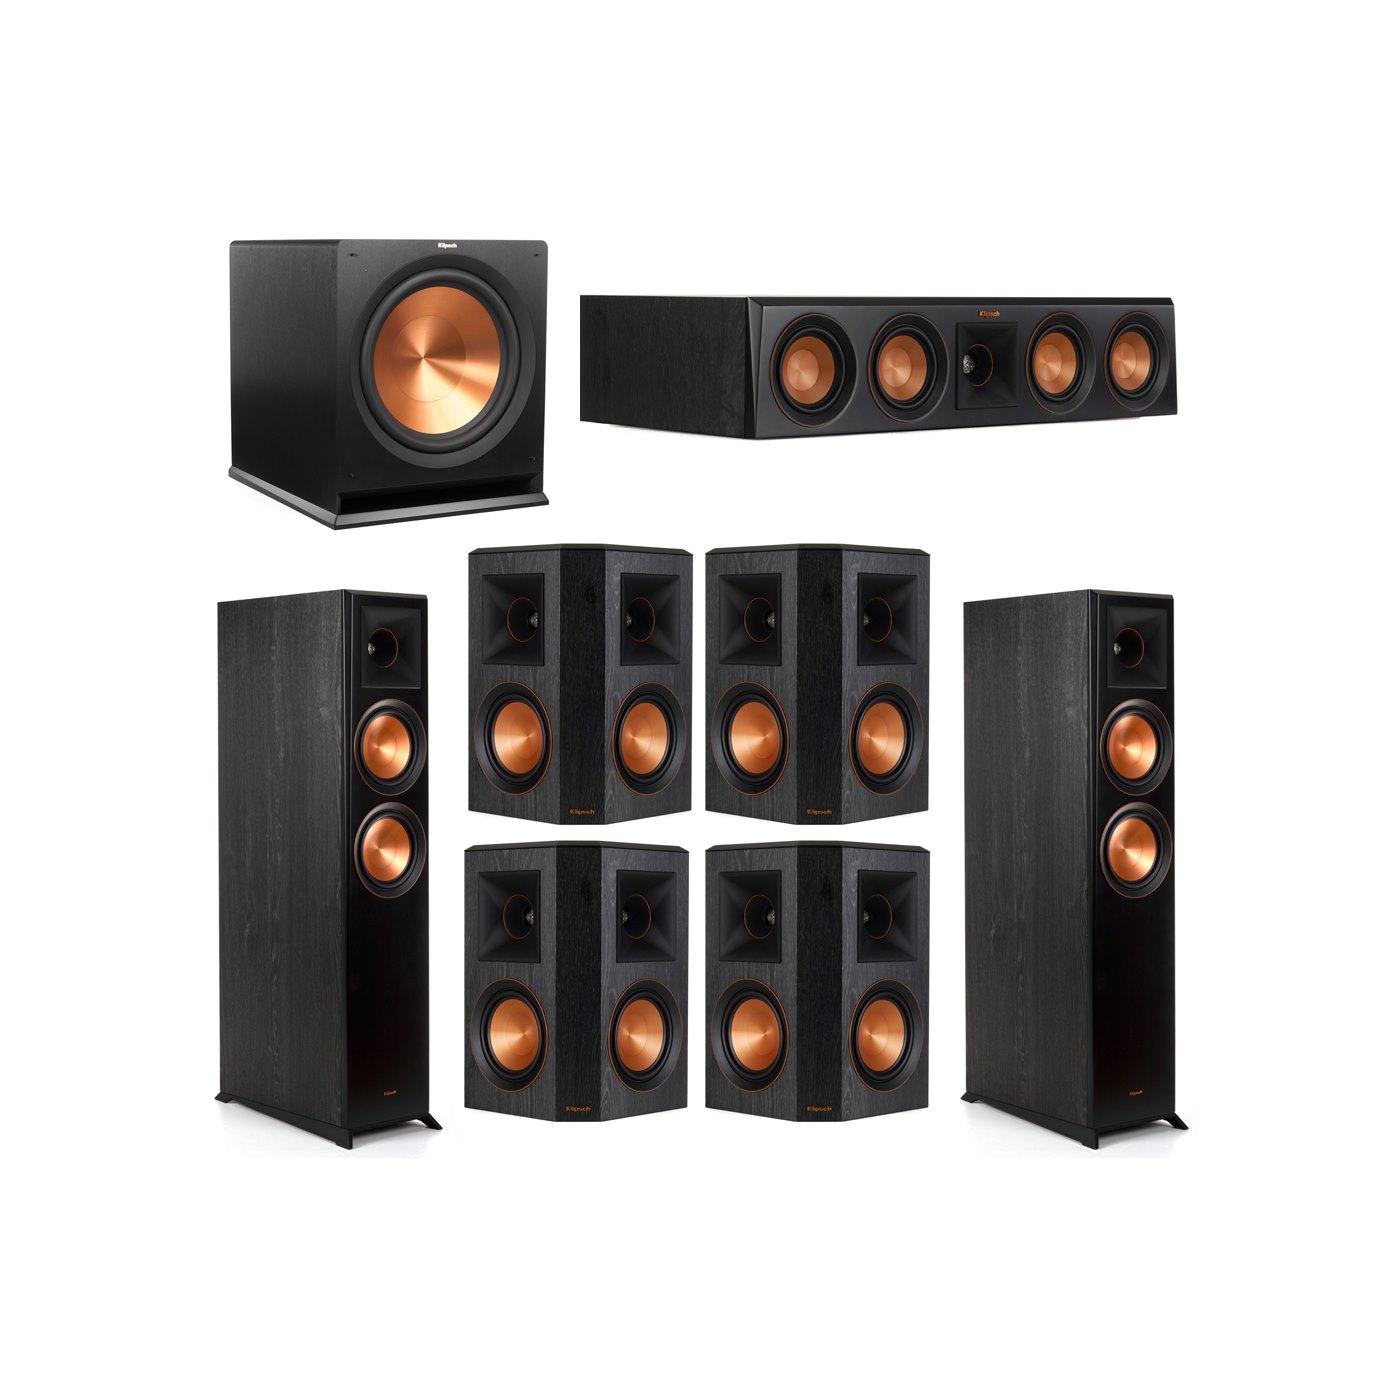 Klipsch 7.1 System with 2 RP-6000F Floorstanding Speakers, 1 Klipsch RP-404C Center Speaker, 4 Klipsch RP-502S Surround Speakers, 1 Klipsch R-115SW Subwoofer